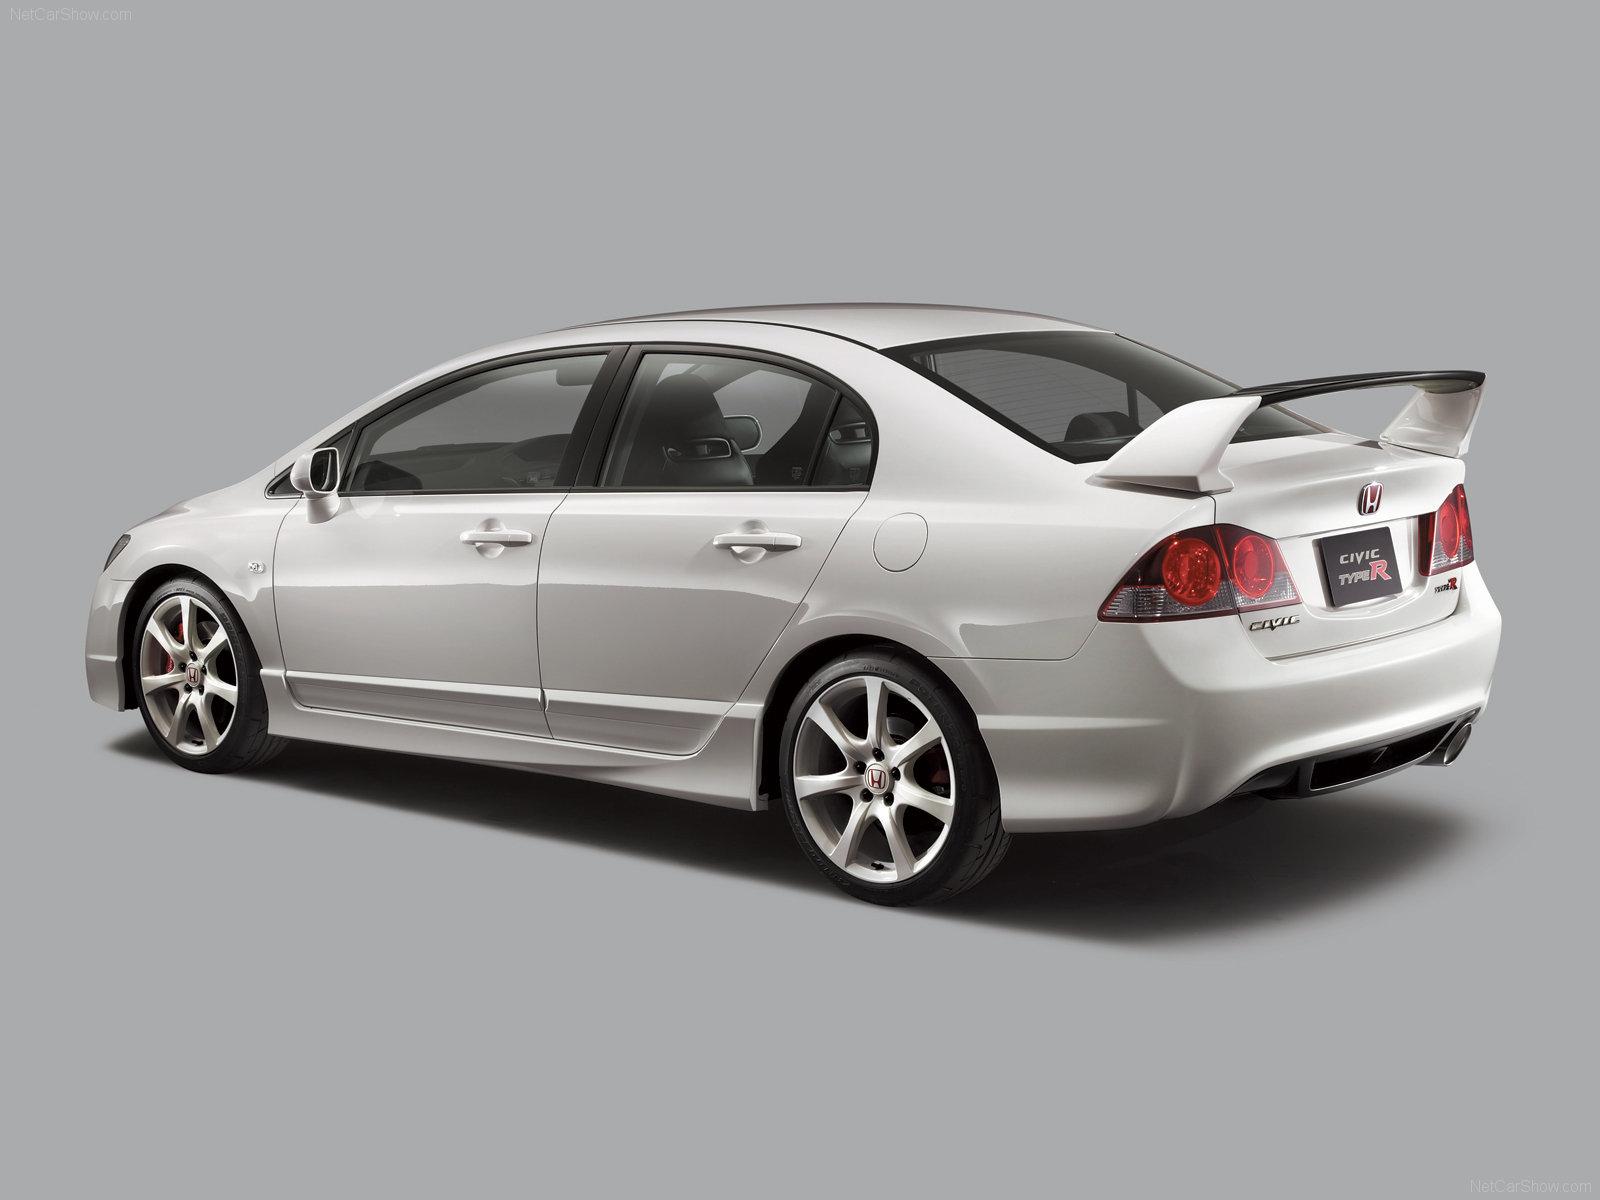 Honda Civic Type-R Sedan photos - PhotoGallery with 12 pics  CarsBase ...